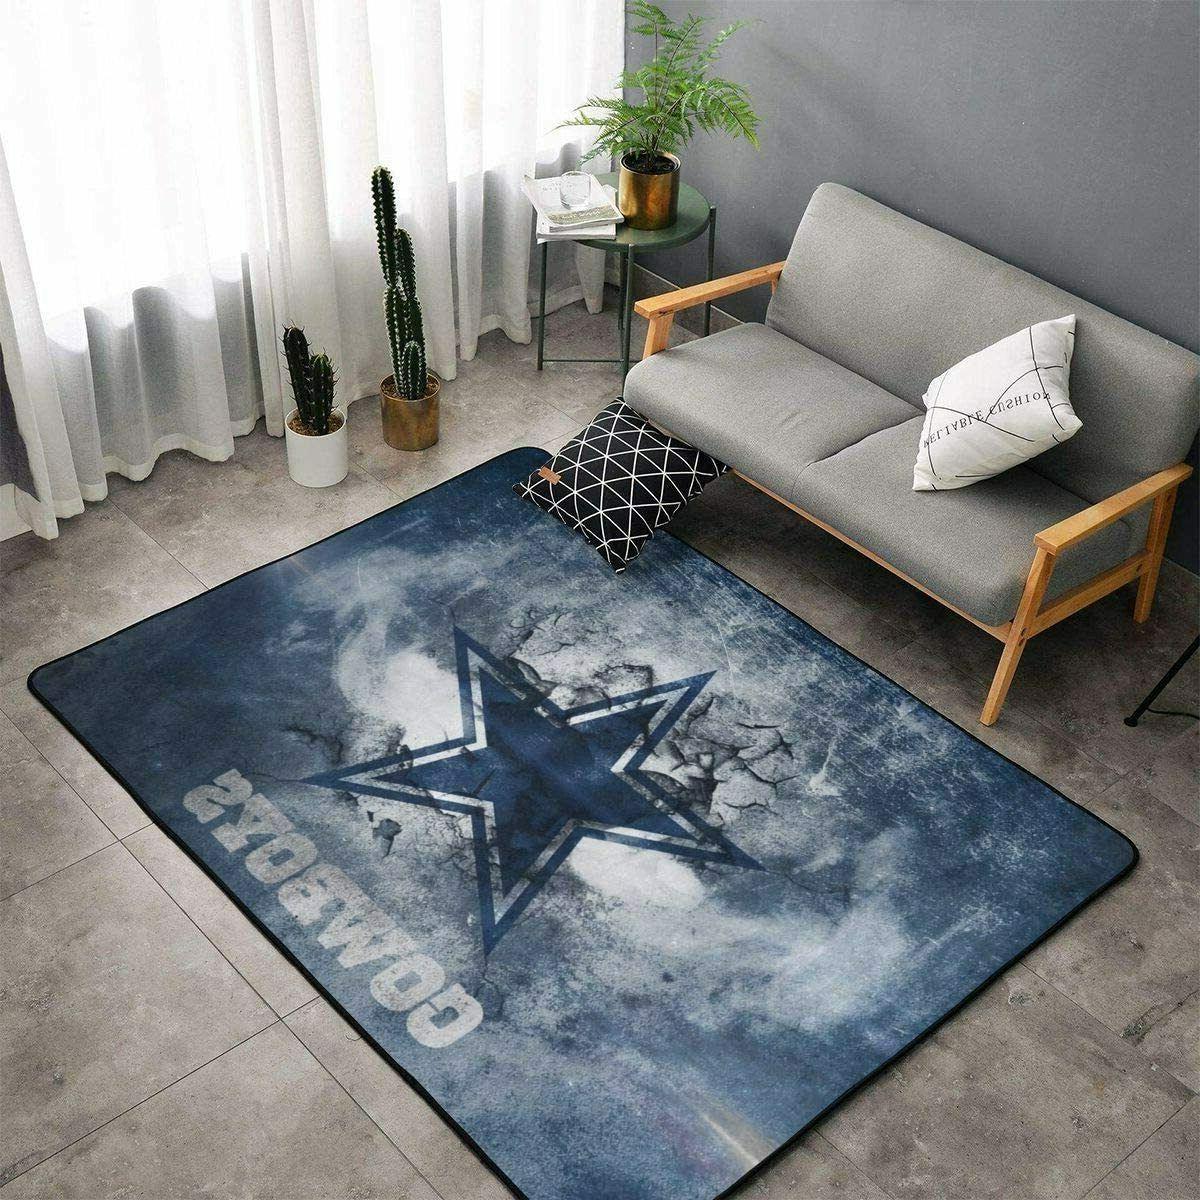 Dallas Cowboys Living Room Rugs Bedroom Floor Mats